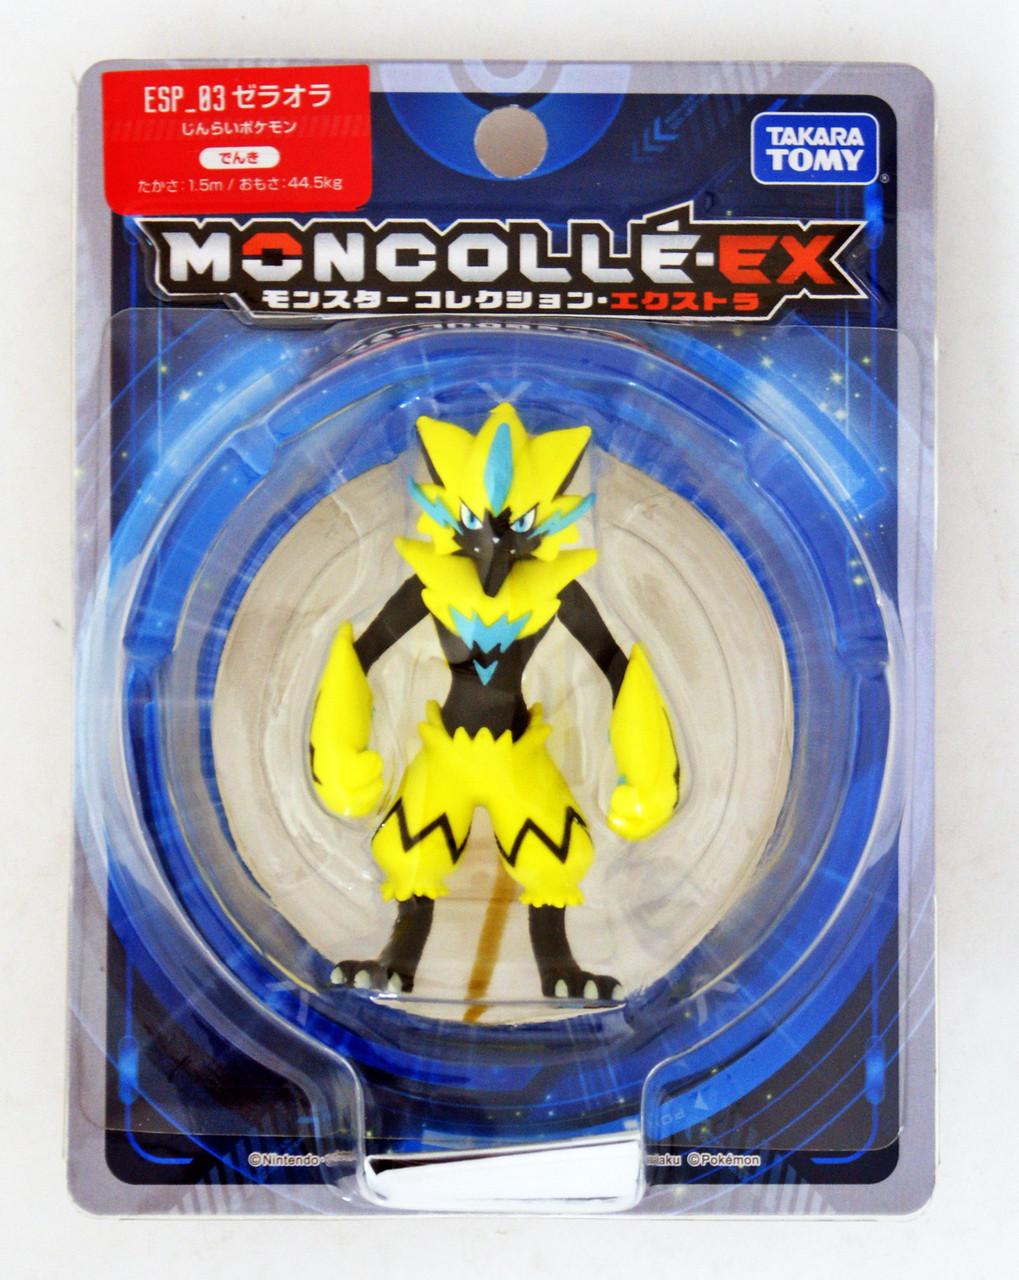 Pokemon Moncolle EX Figure EX ESP/_03 Zeraora TAKARA TOMY From JAPAN